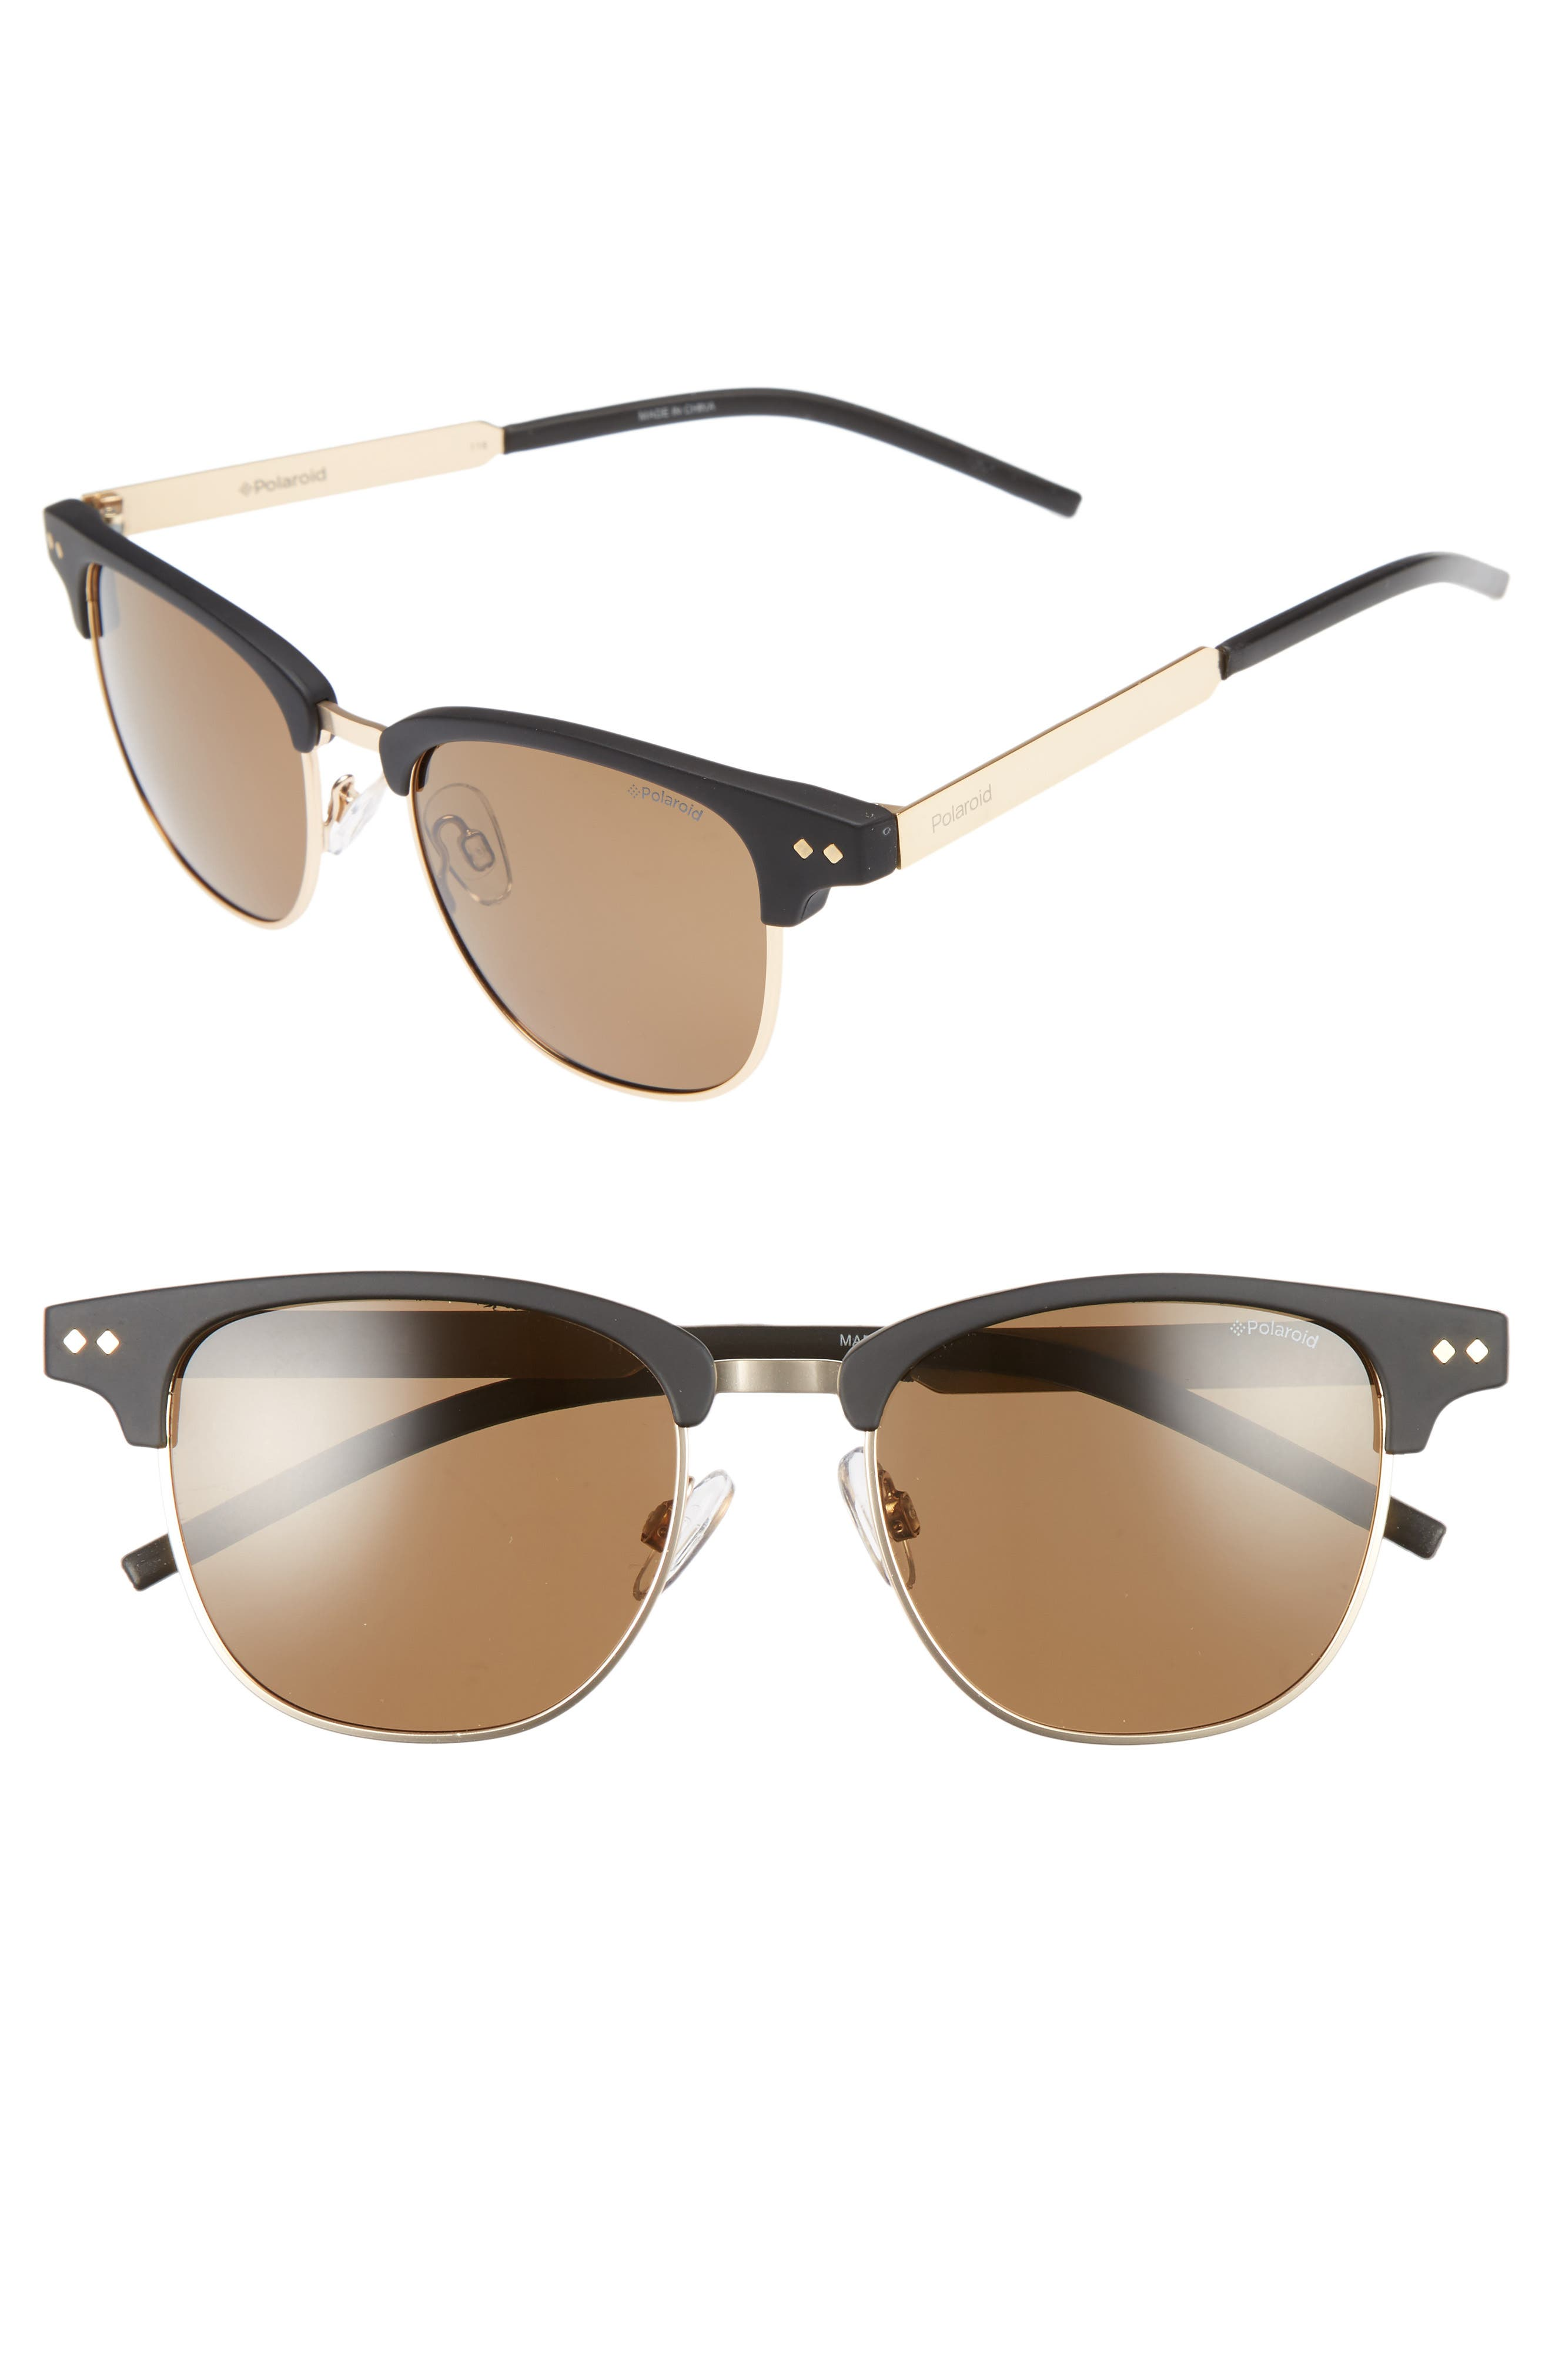 51mm Polarized Cat Eye Sunglasses,                         Main,                         color, 001